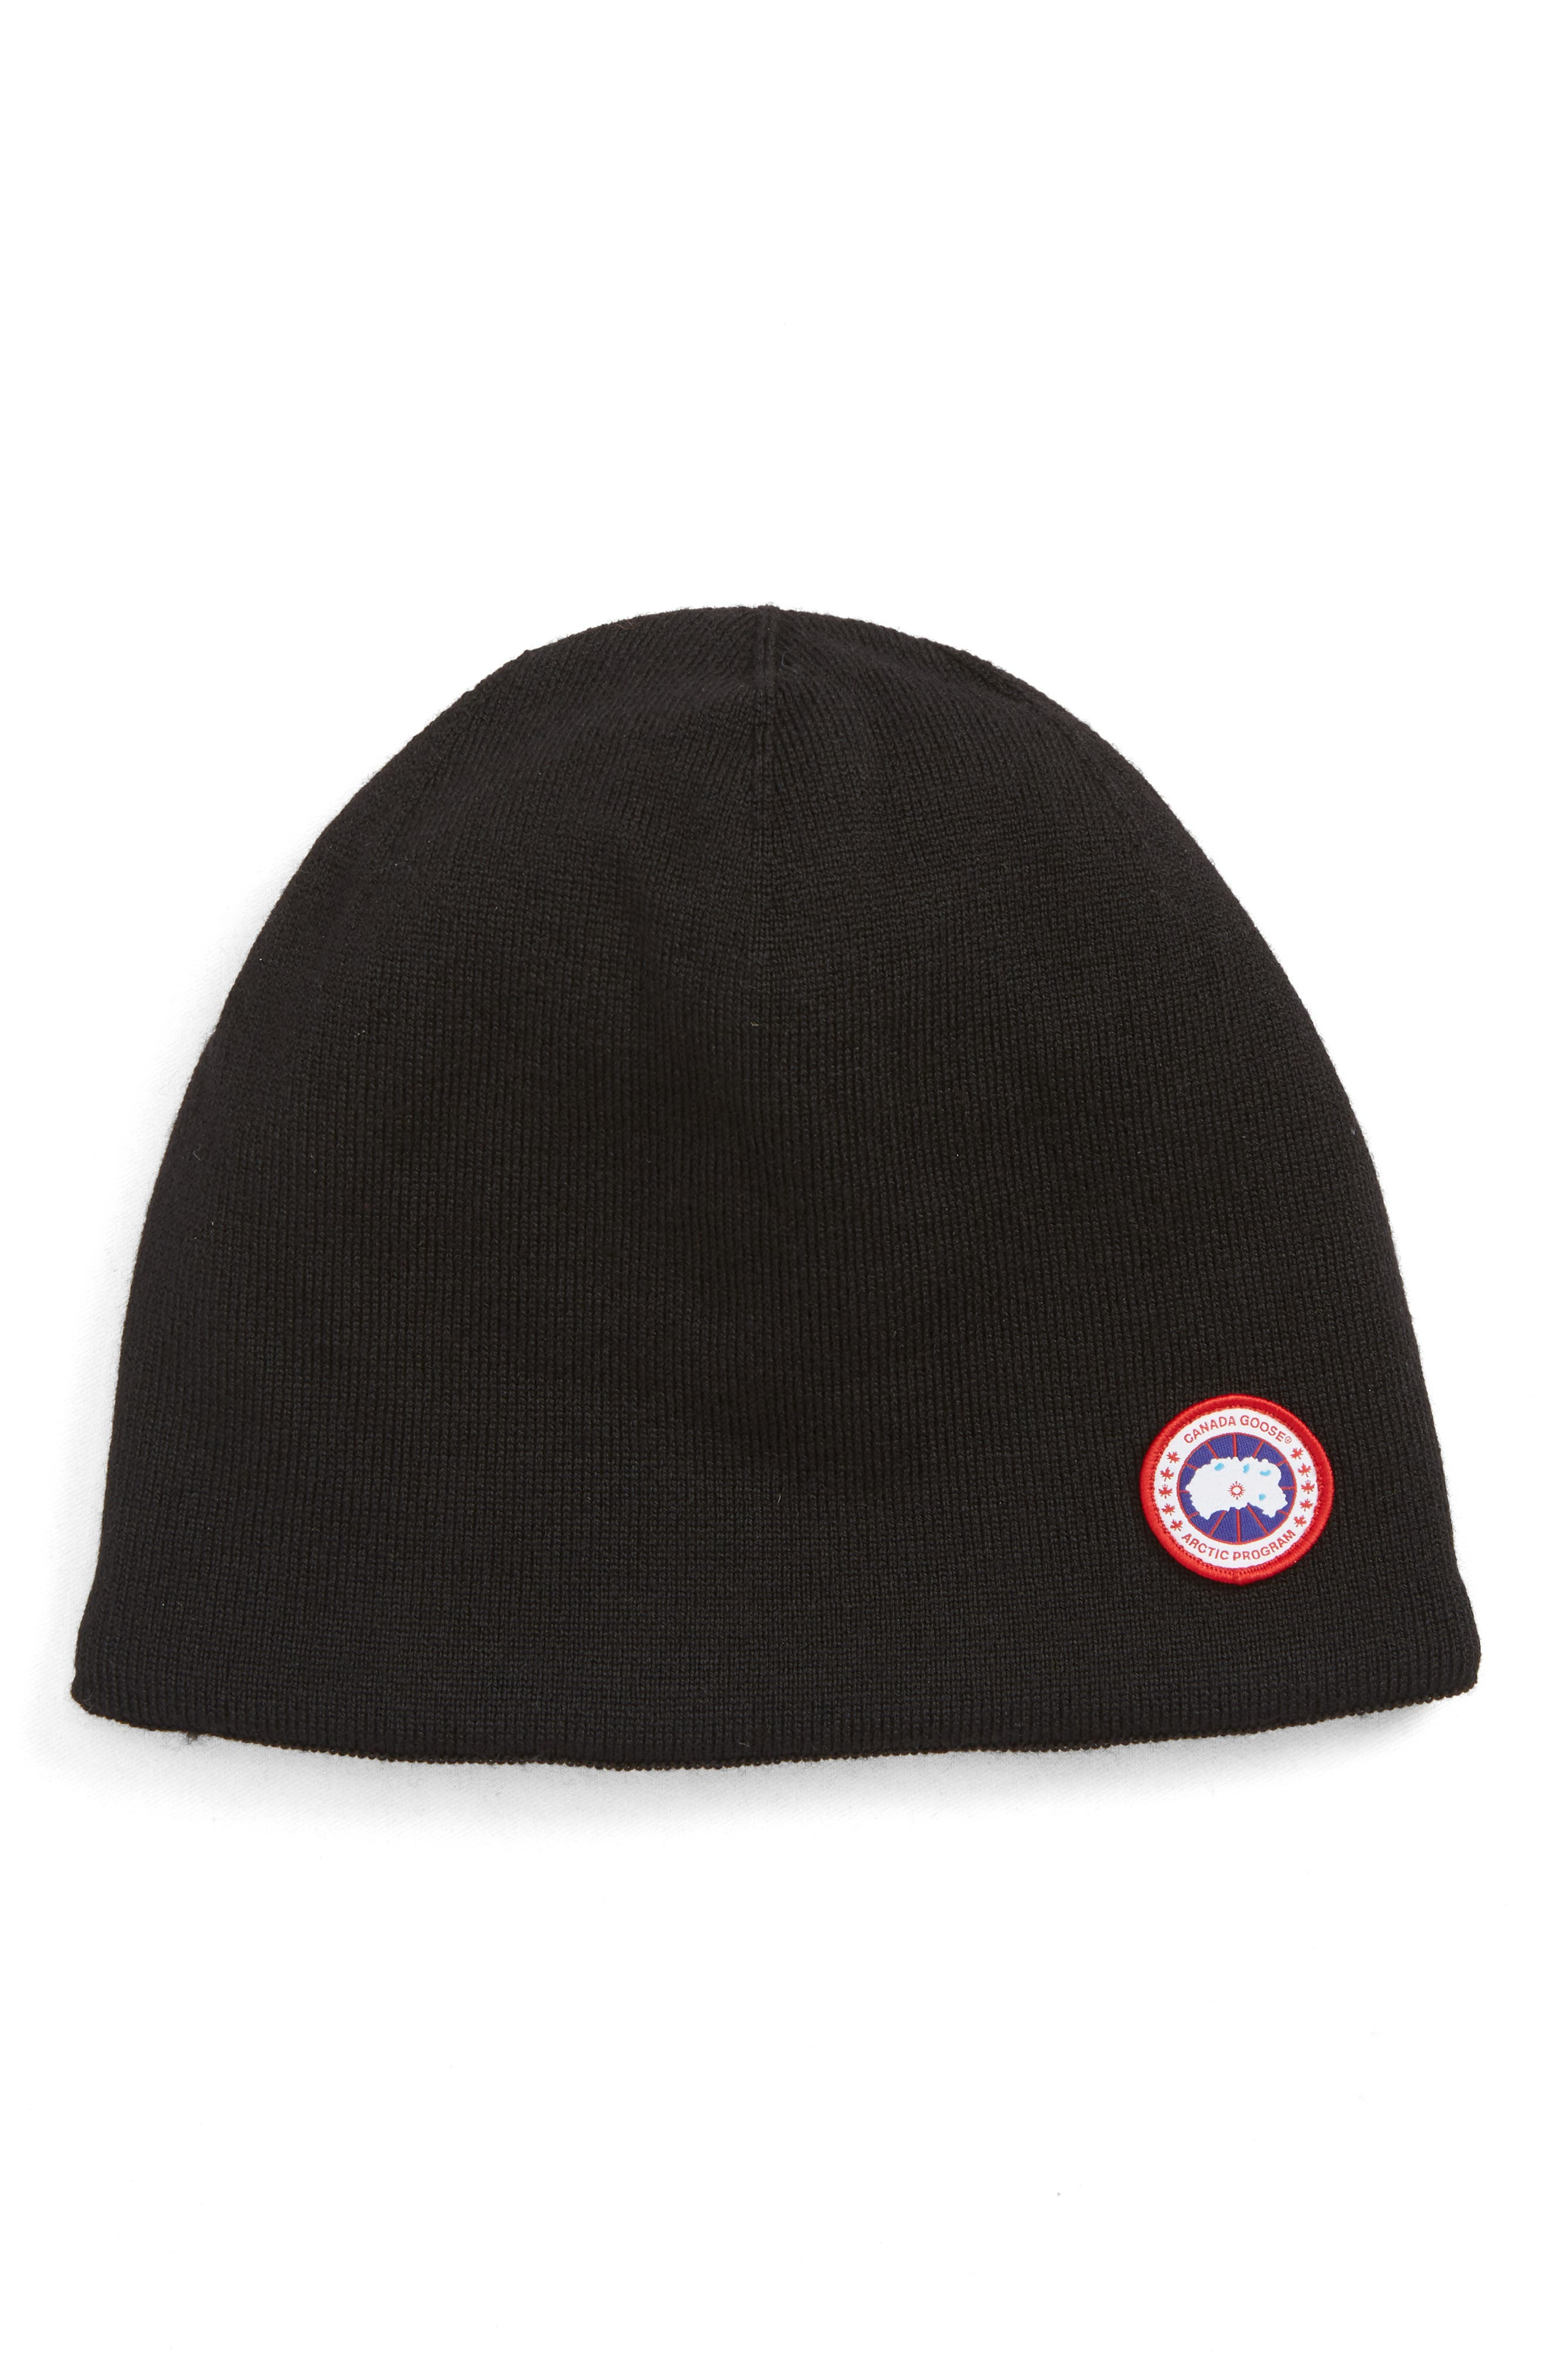 CANADA GOOSE Standard Wool Blend Beanie, Main, color, BLACK